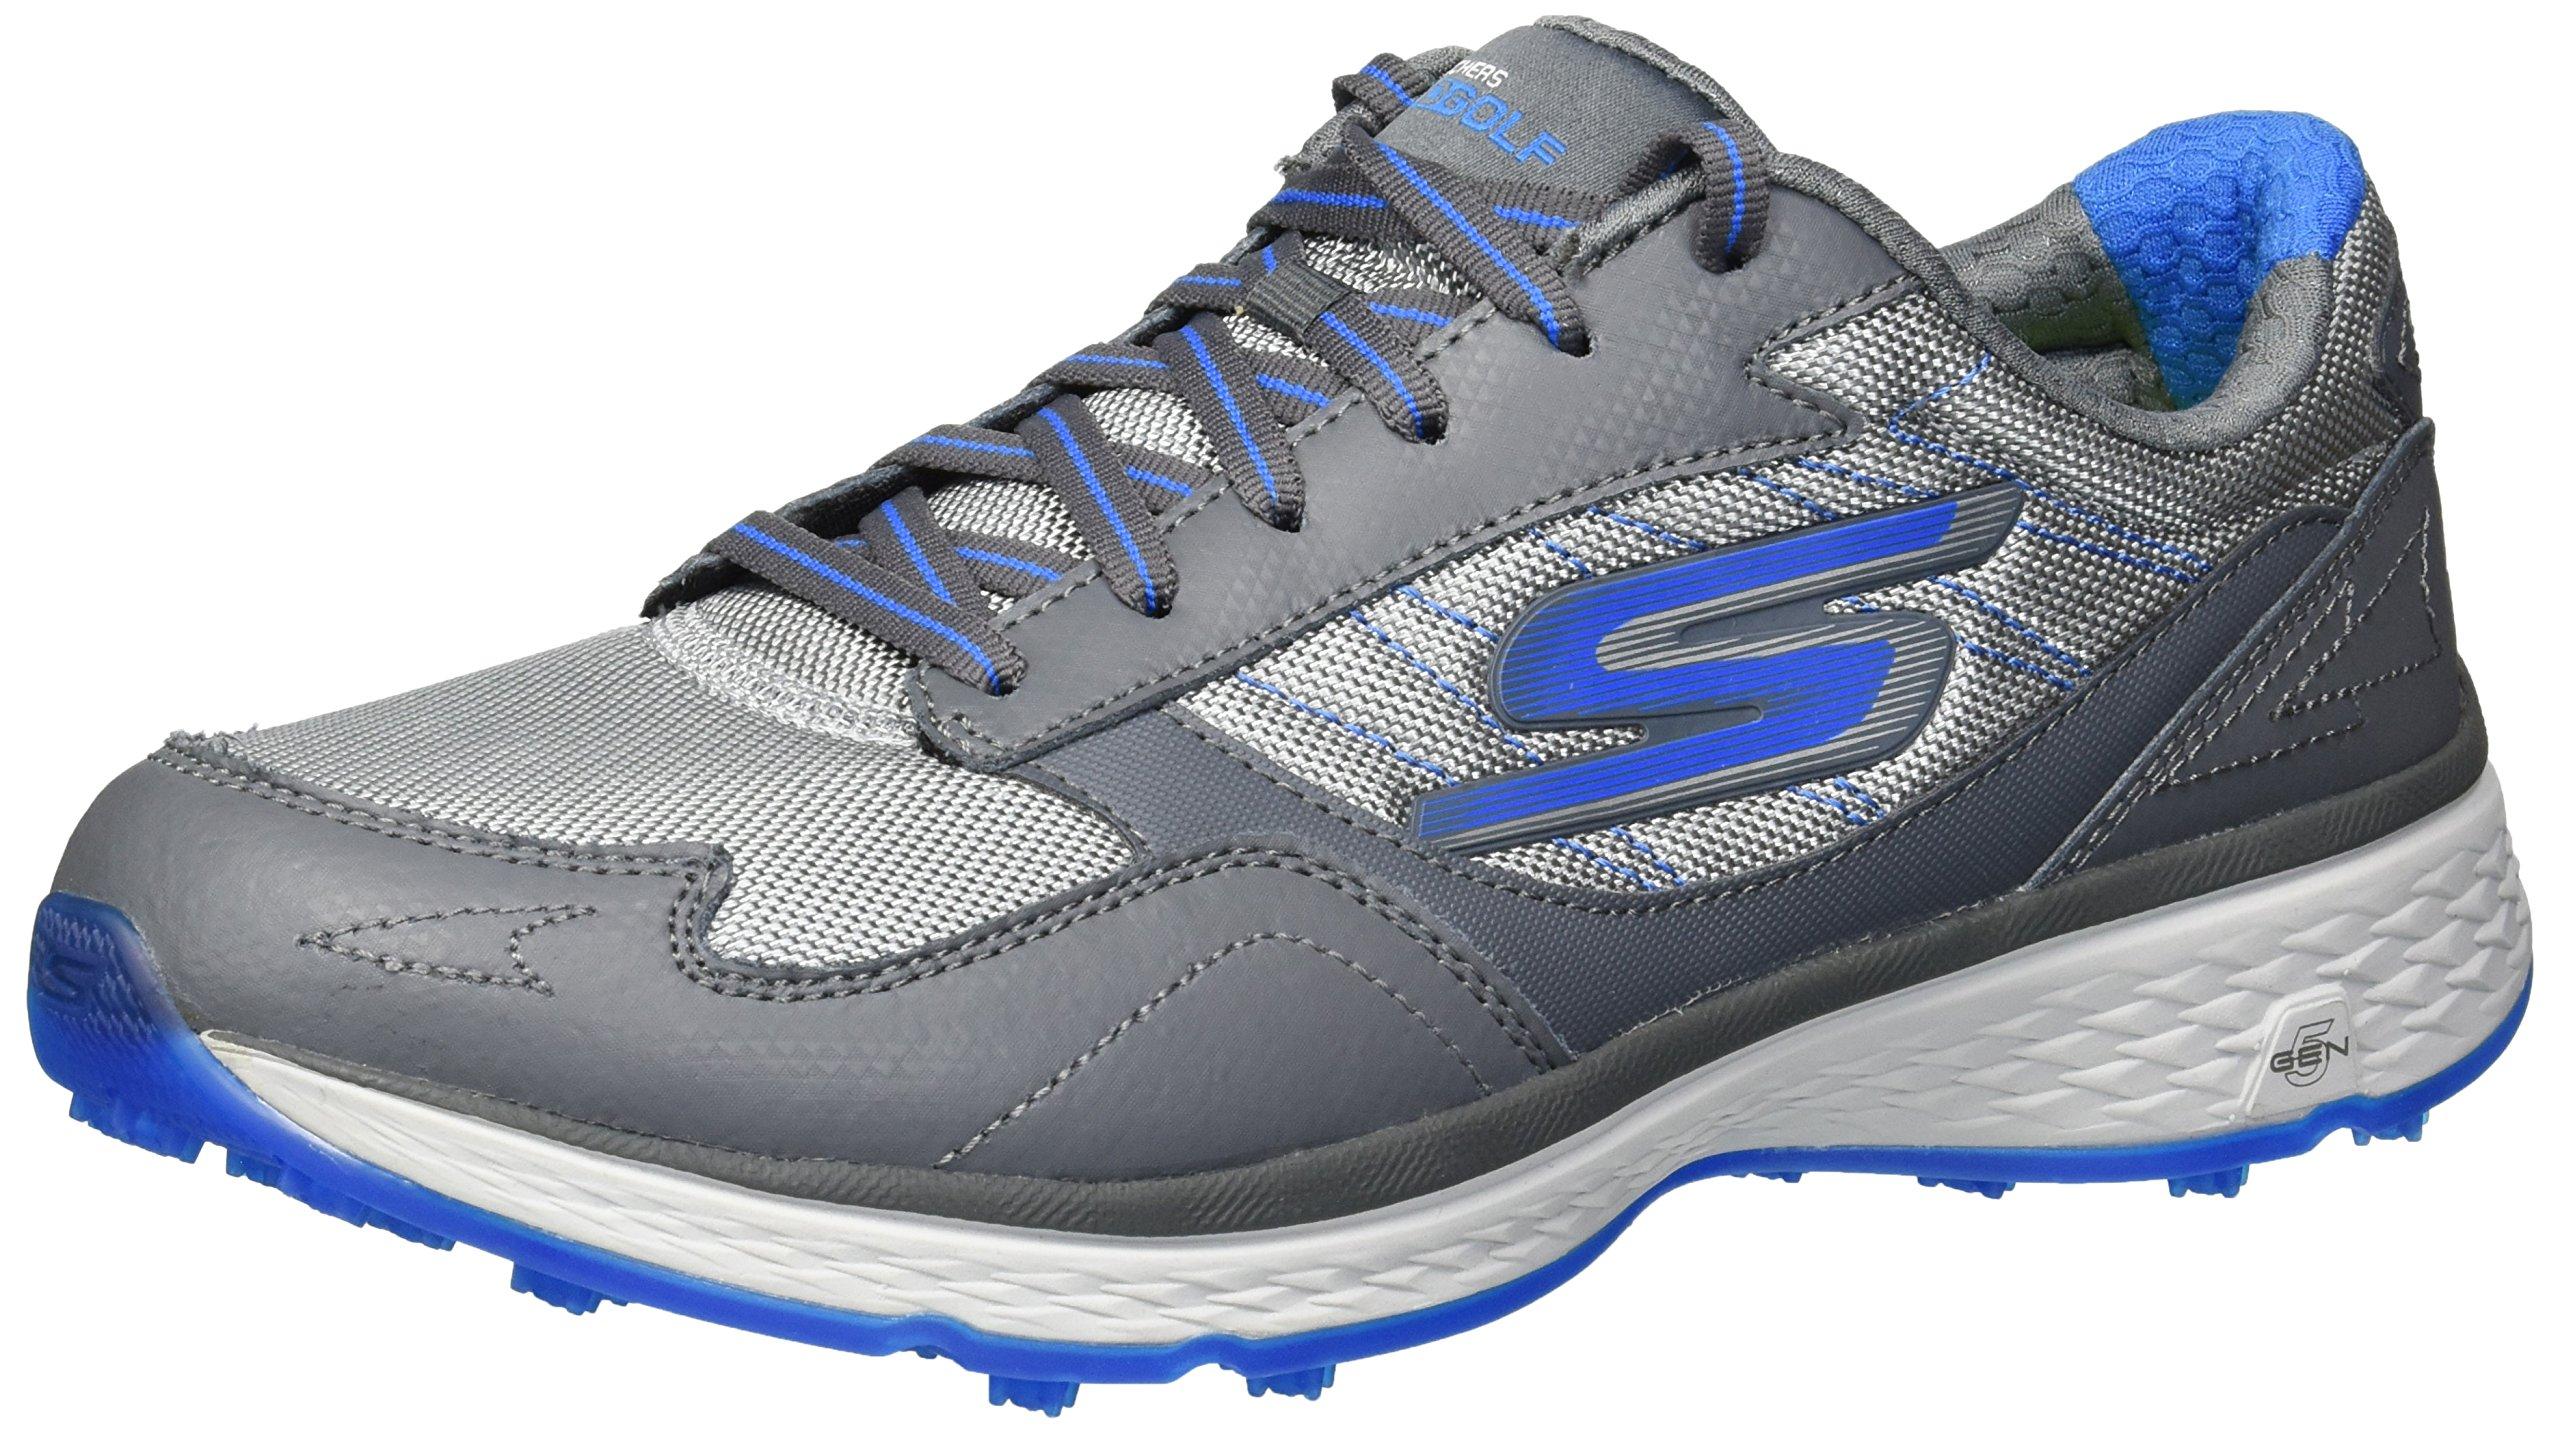 Skechers Golf Men's Go Golf Fairway Golf Shoe, Charcoal/Blue, 7.5 M US